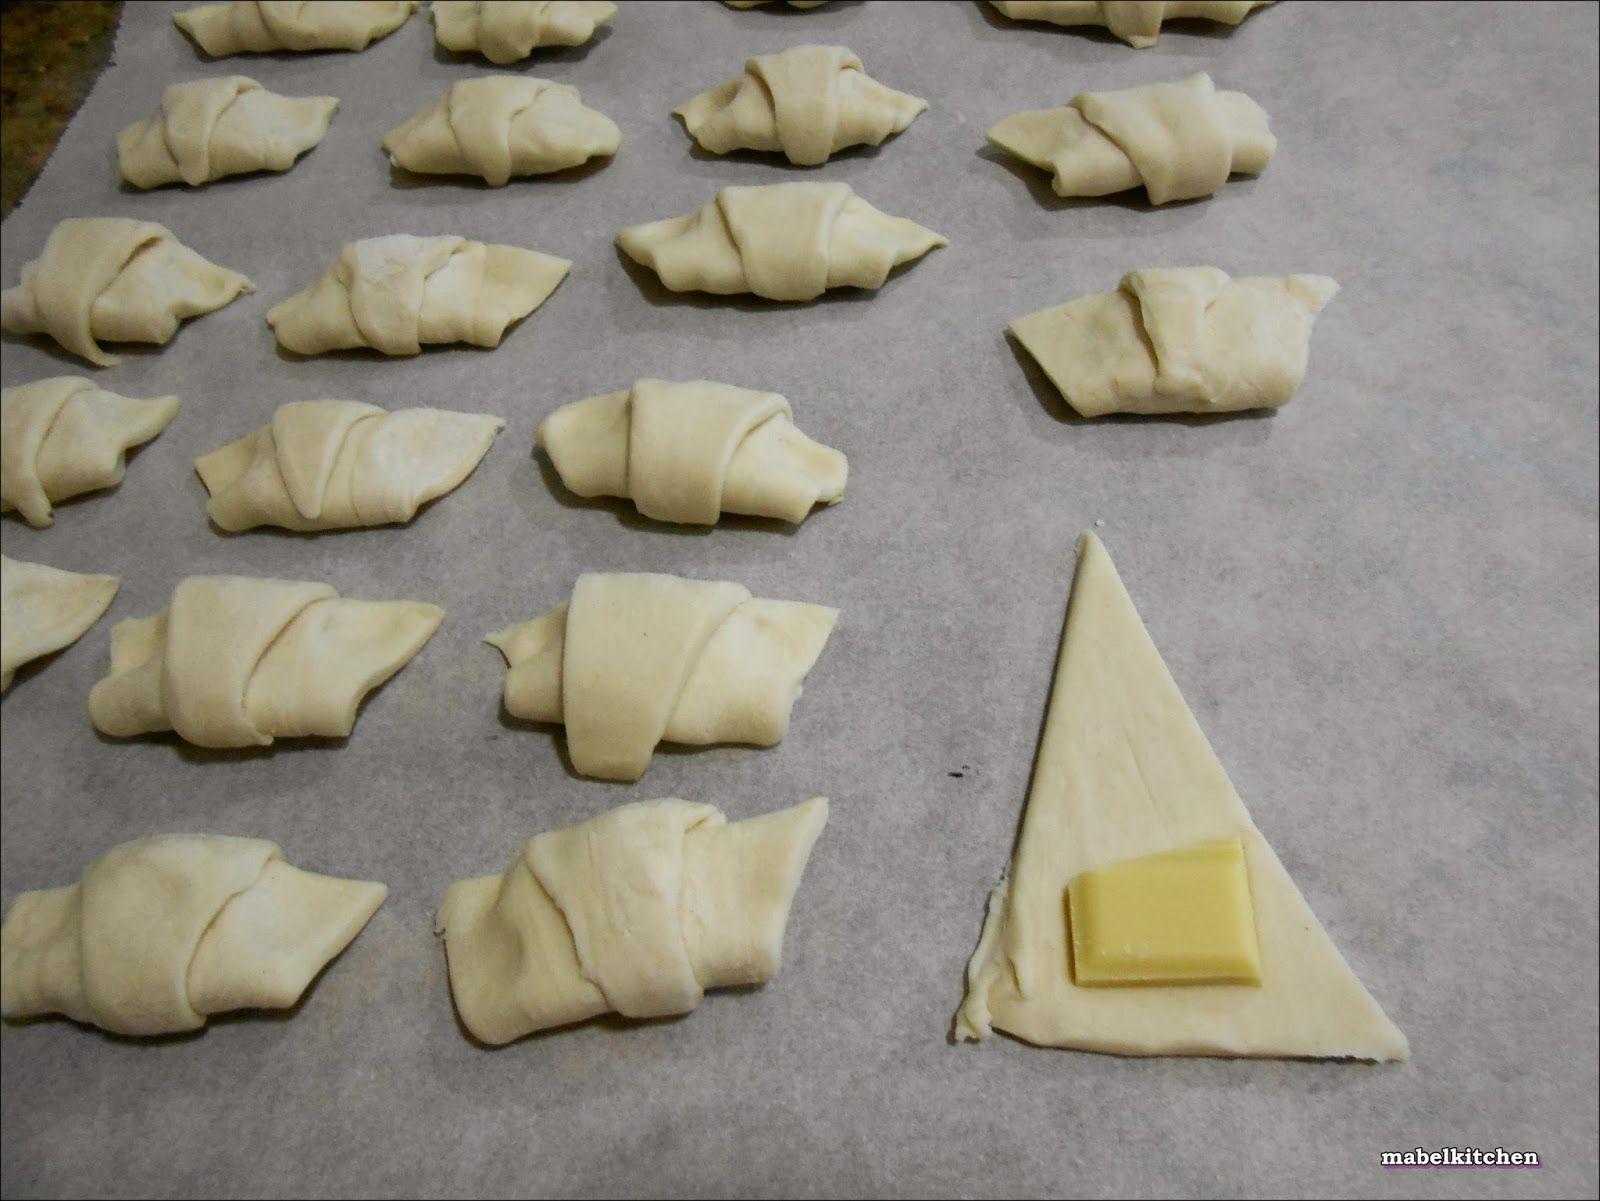 Mabel's Kitchen: MINICROISSANTS DE CHOCOLATE BLANCO.